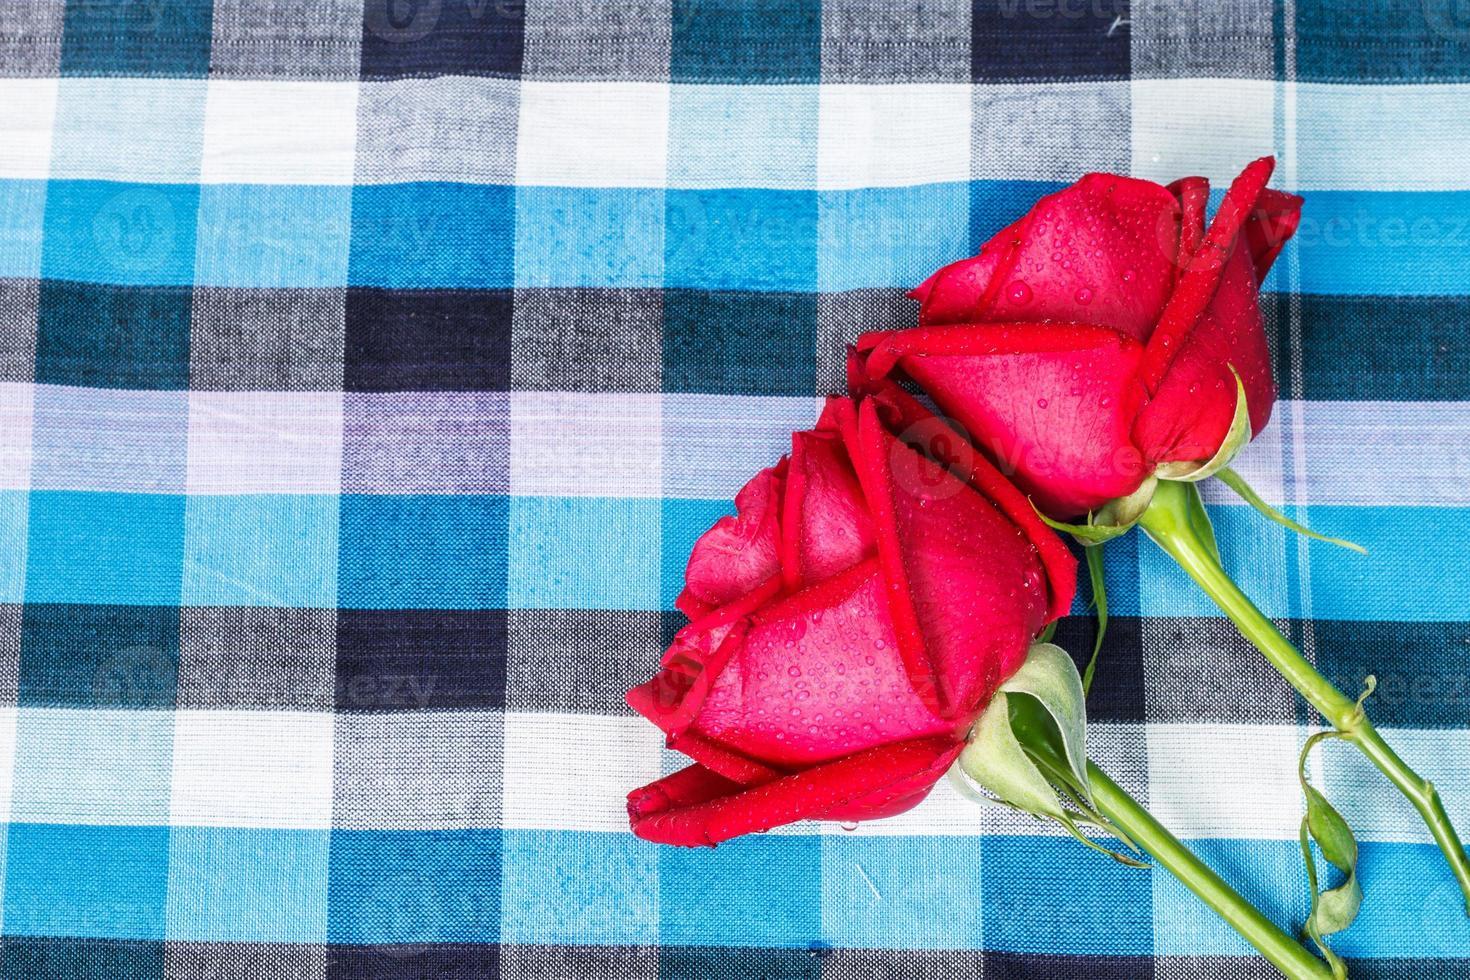 rode roos met geruite stof achtergrond foto